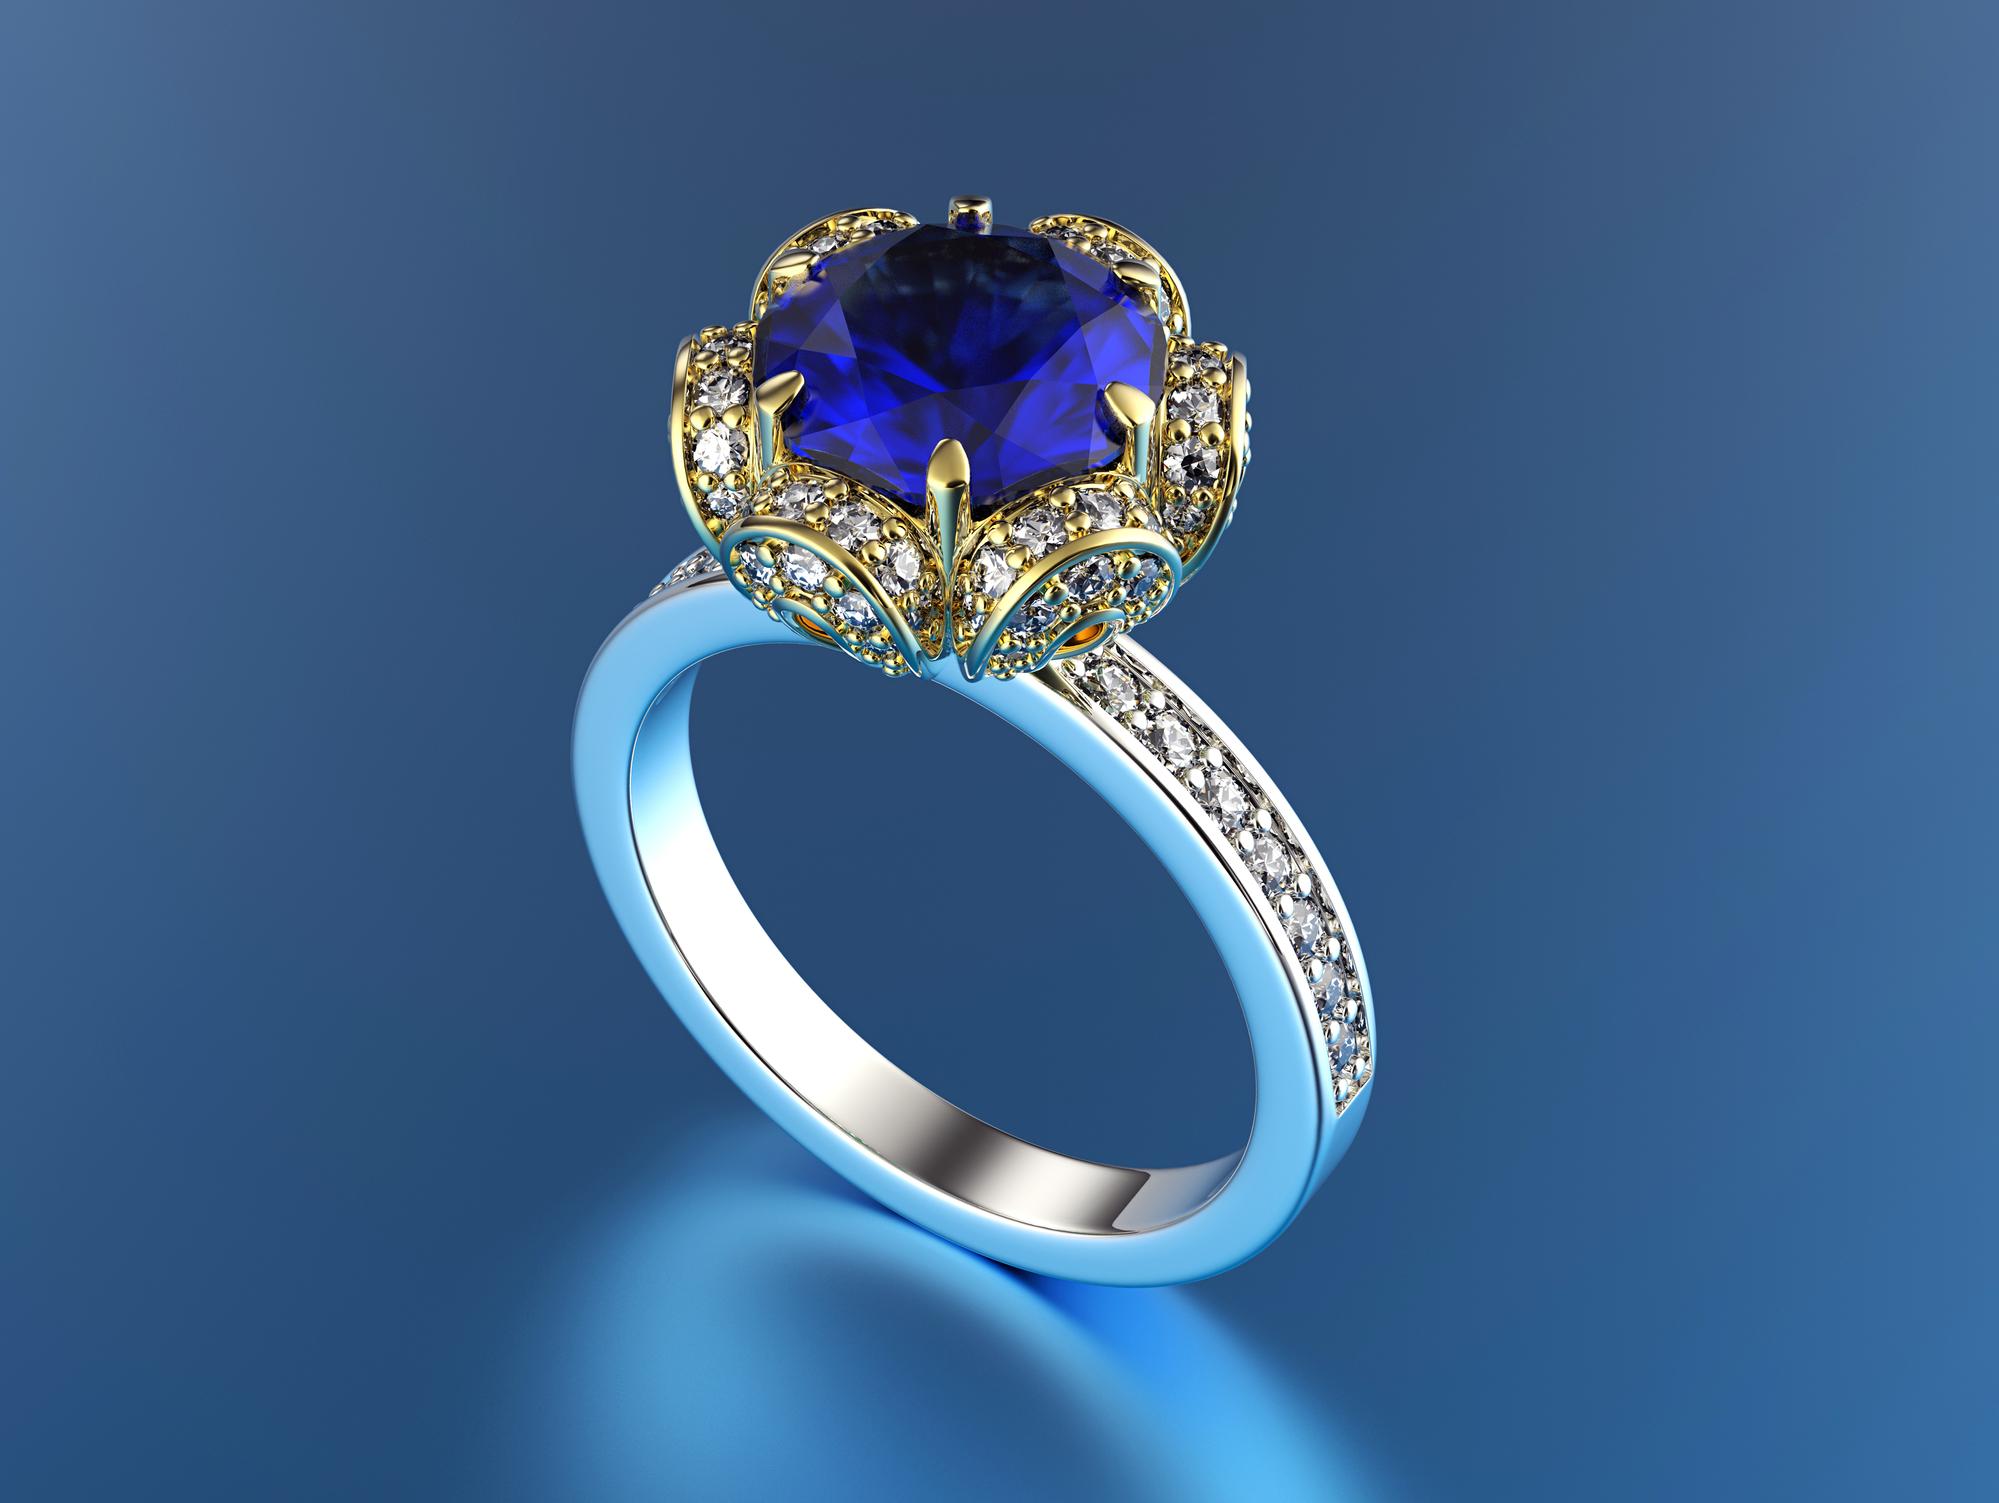 jewelry manufacturer